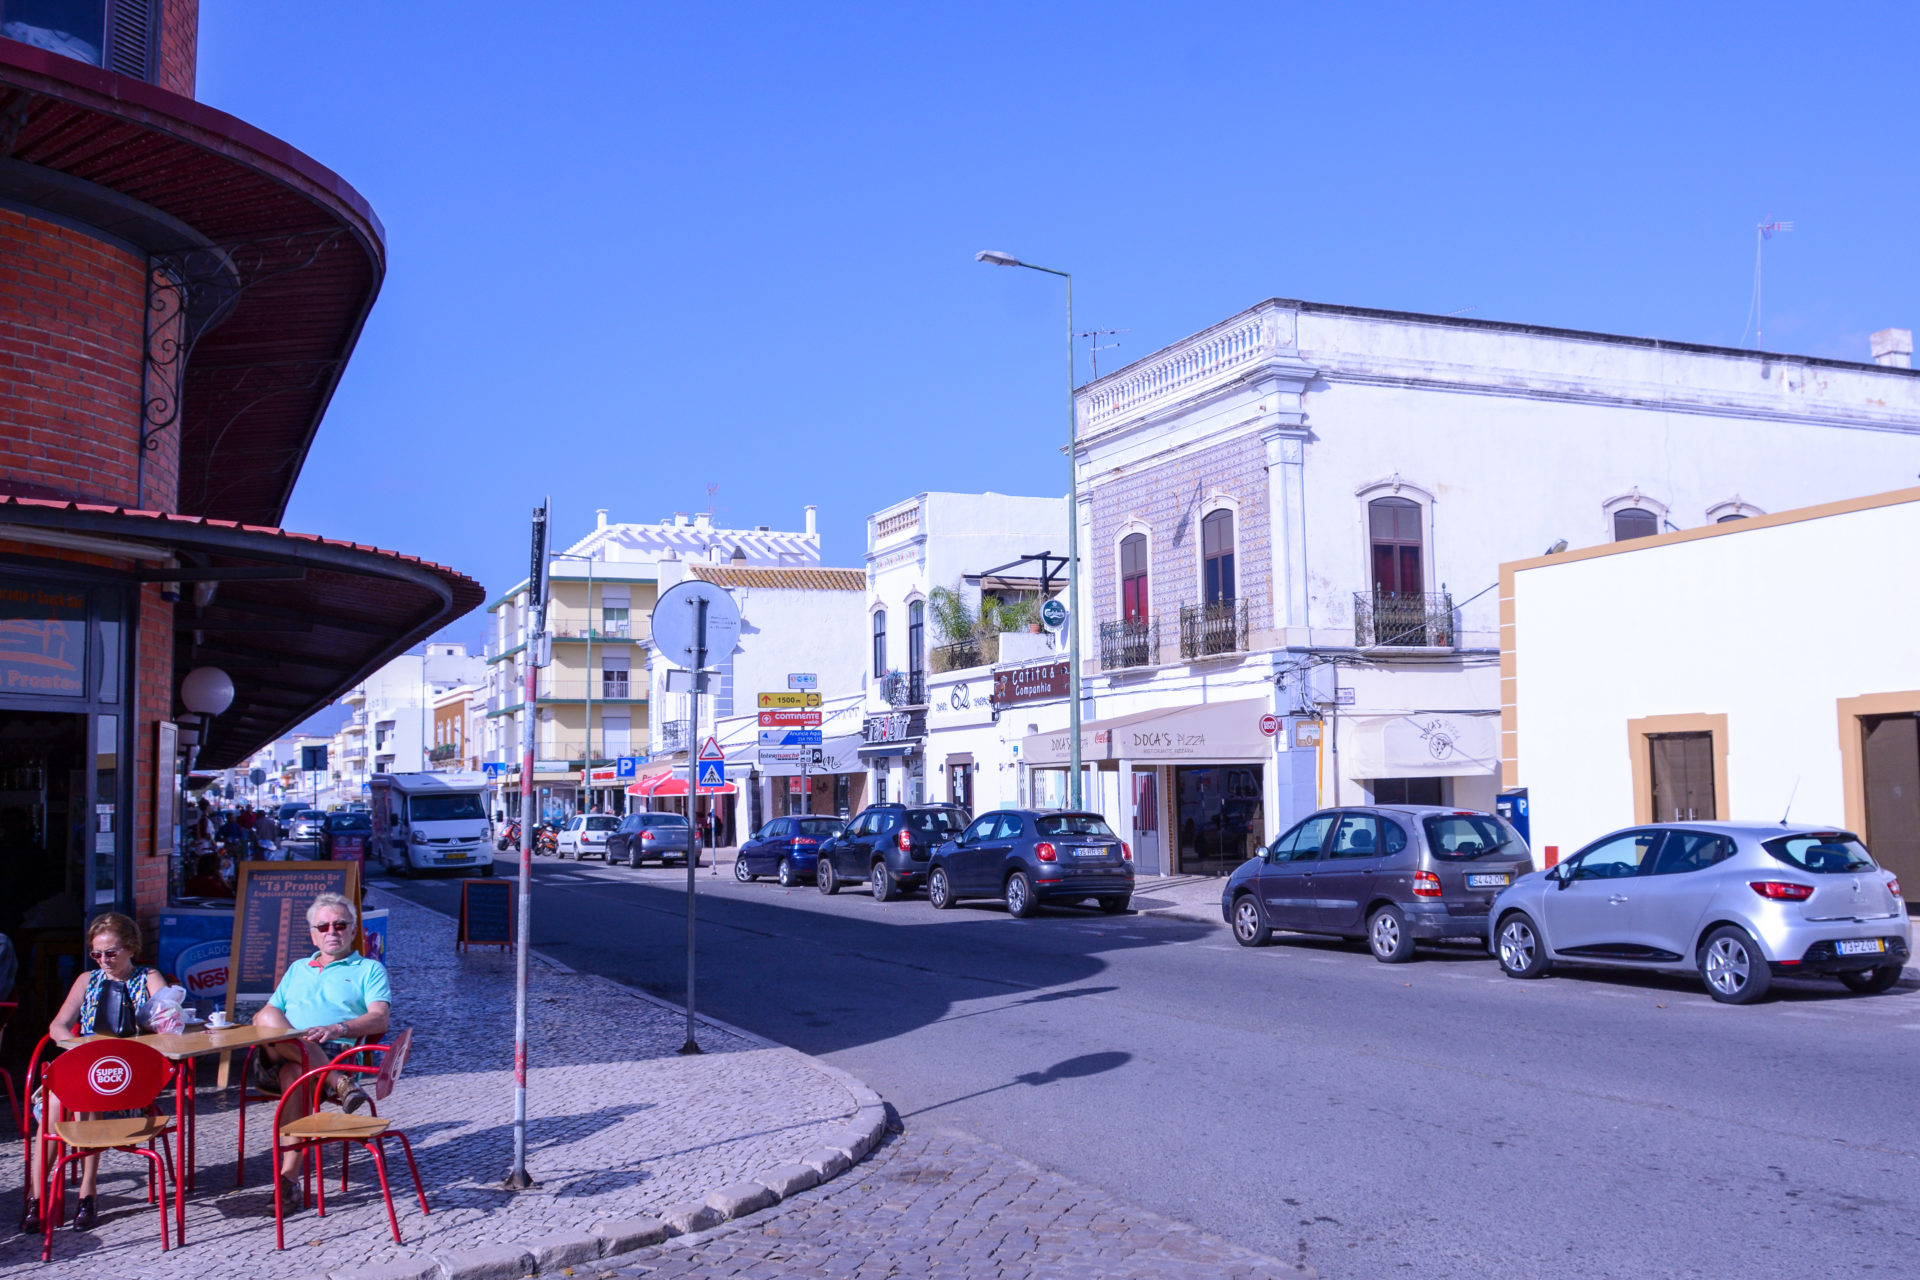 Straßenbild mit Café in Olhão in Portugal